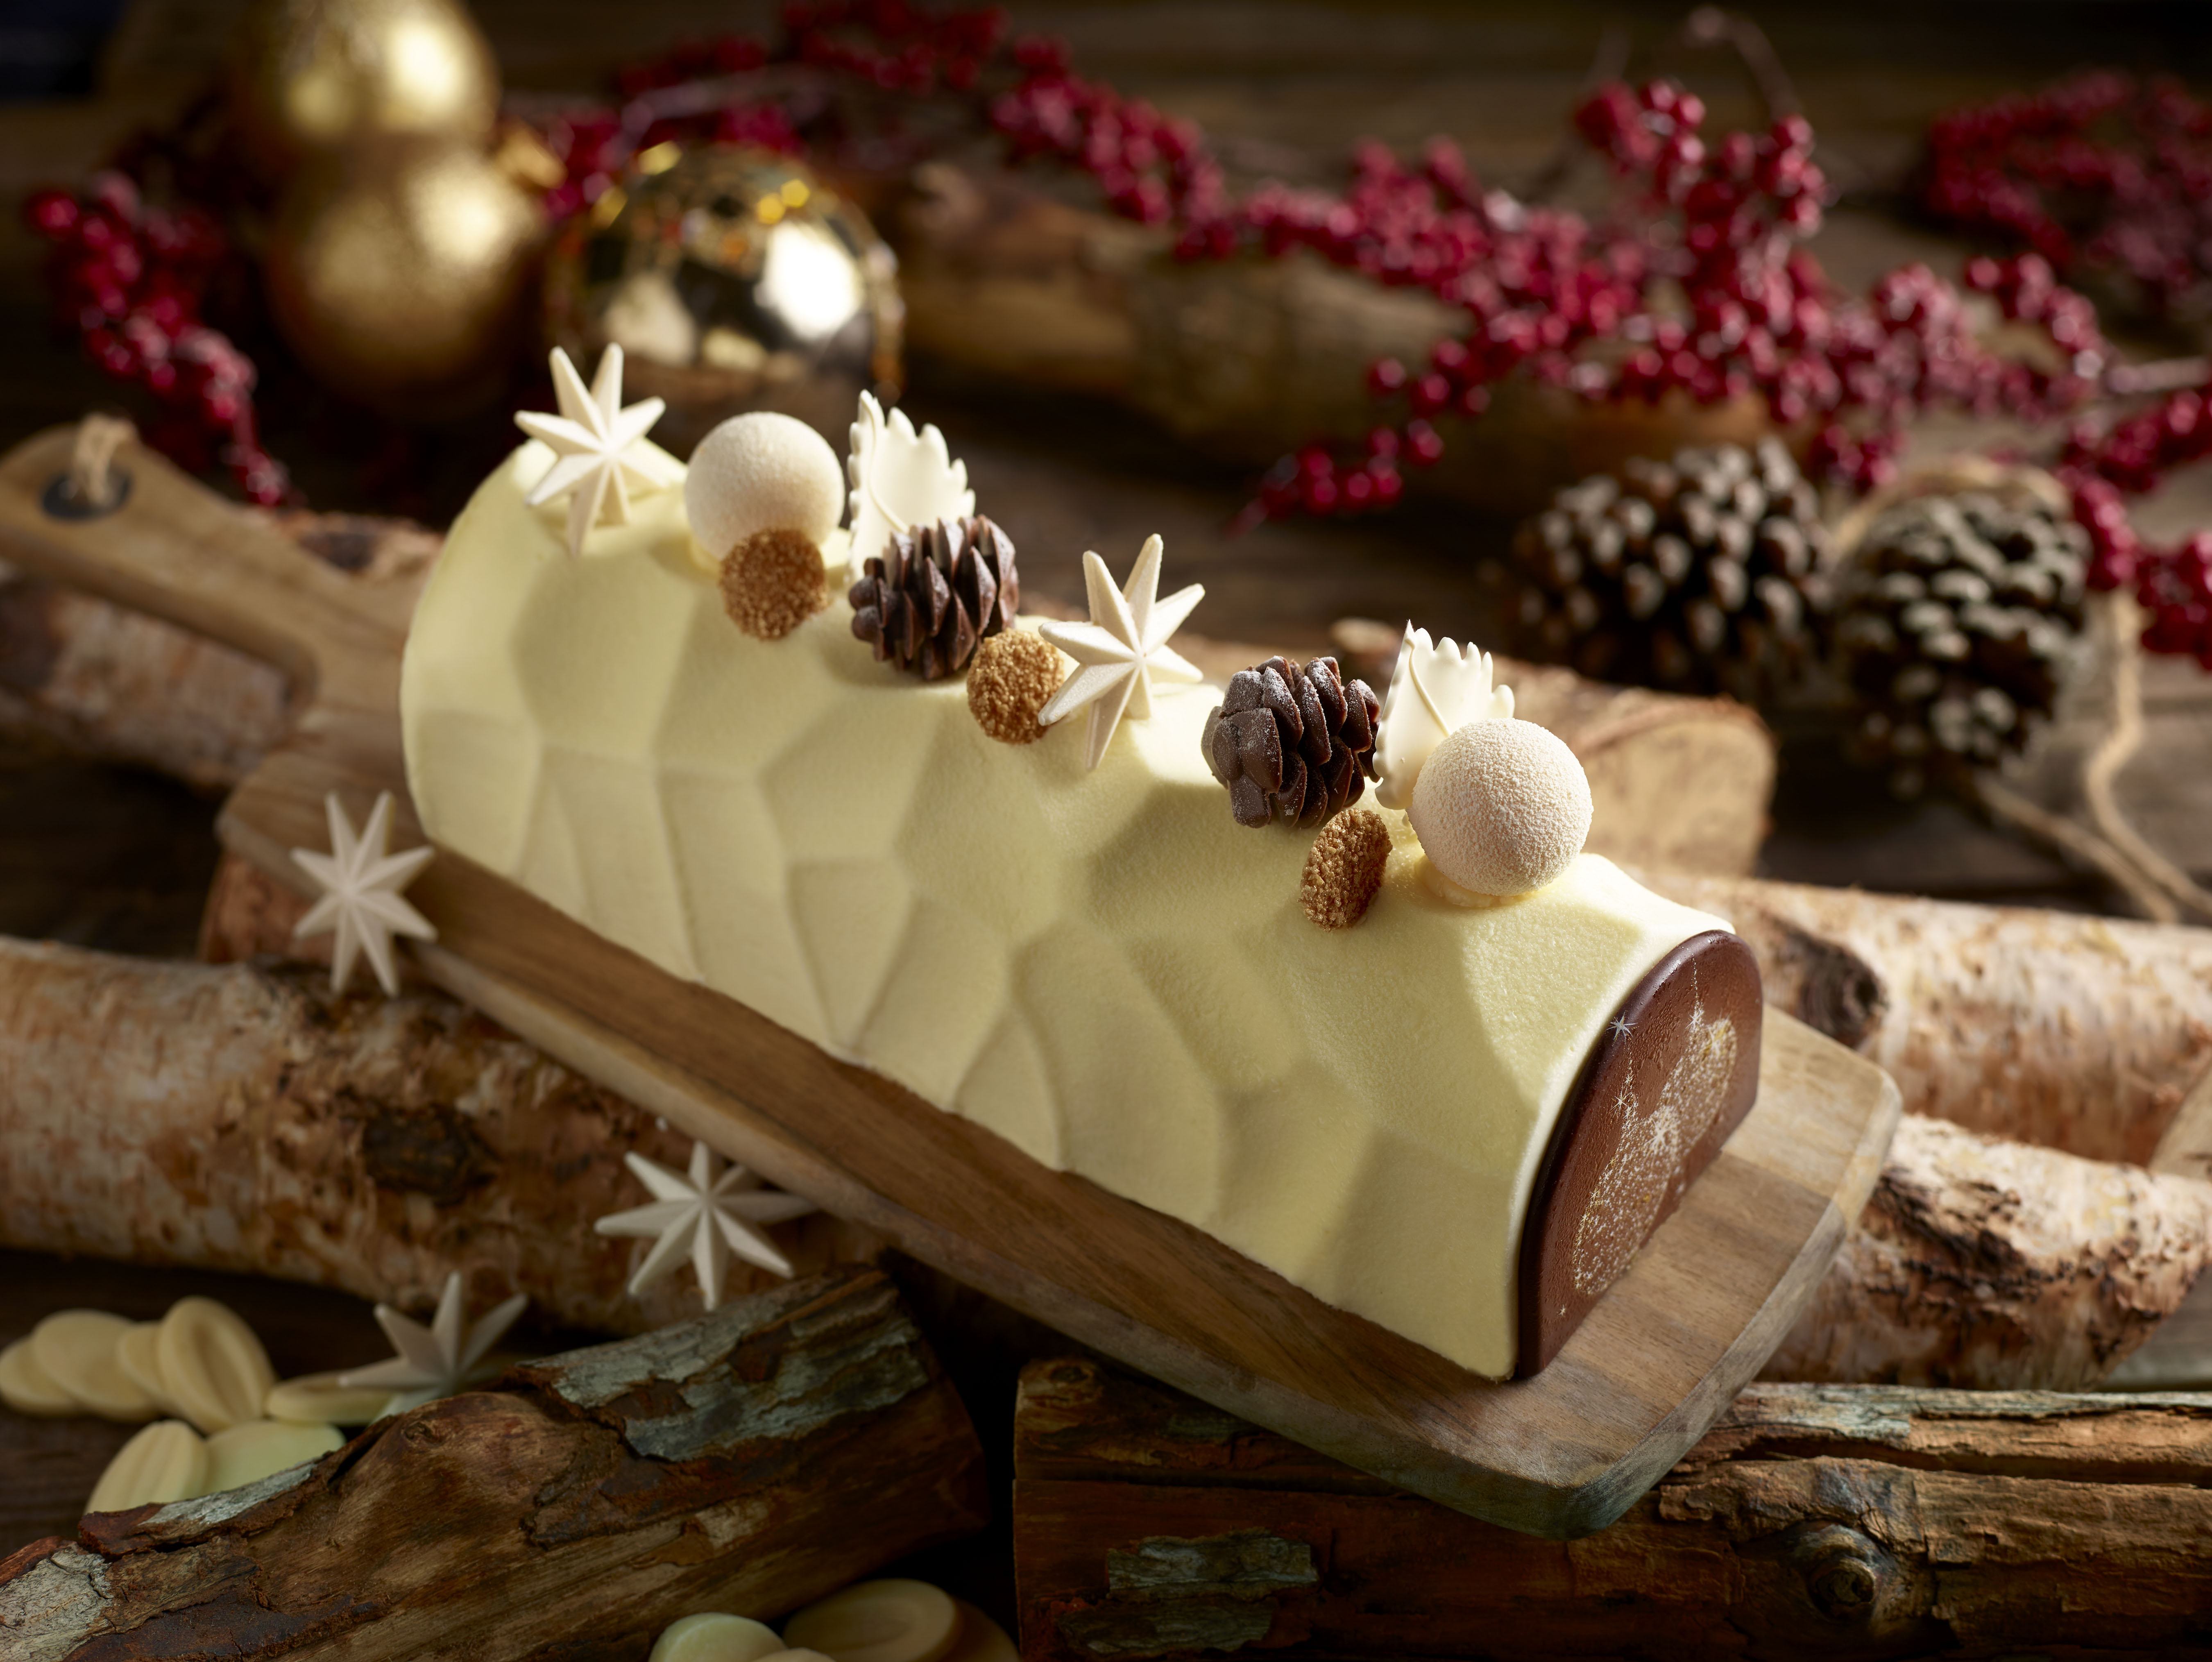 Ellenborough市场Cafe_Ivory芙娜圣诞柴与潘丹颤音,白芝麻慕斯与青木红豆